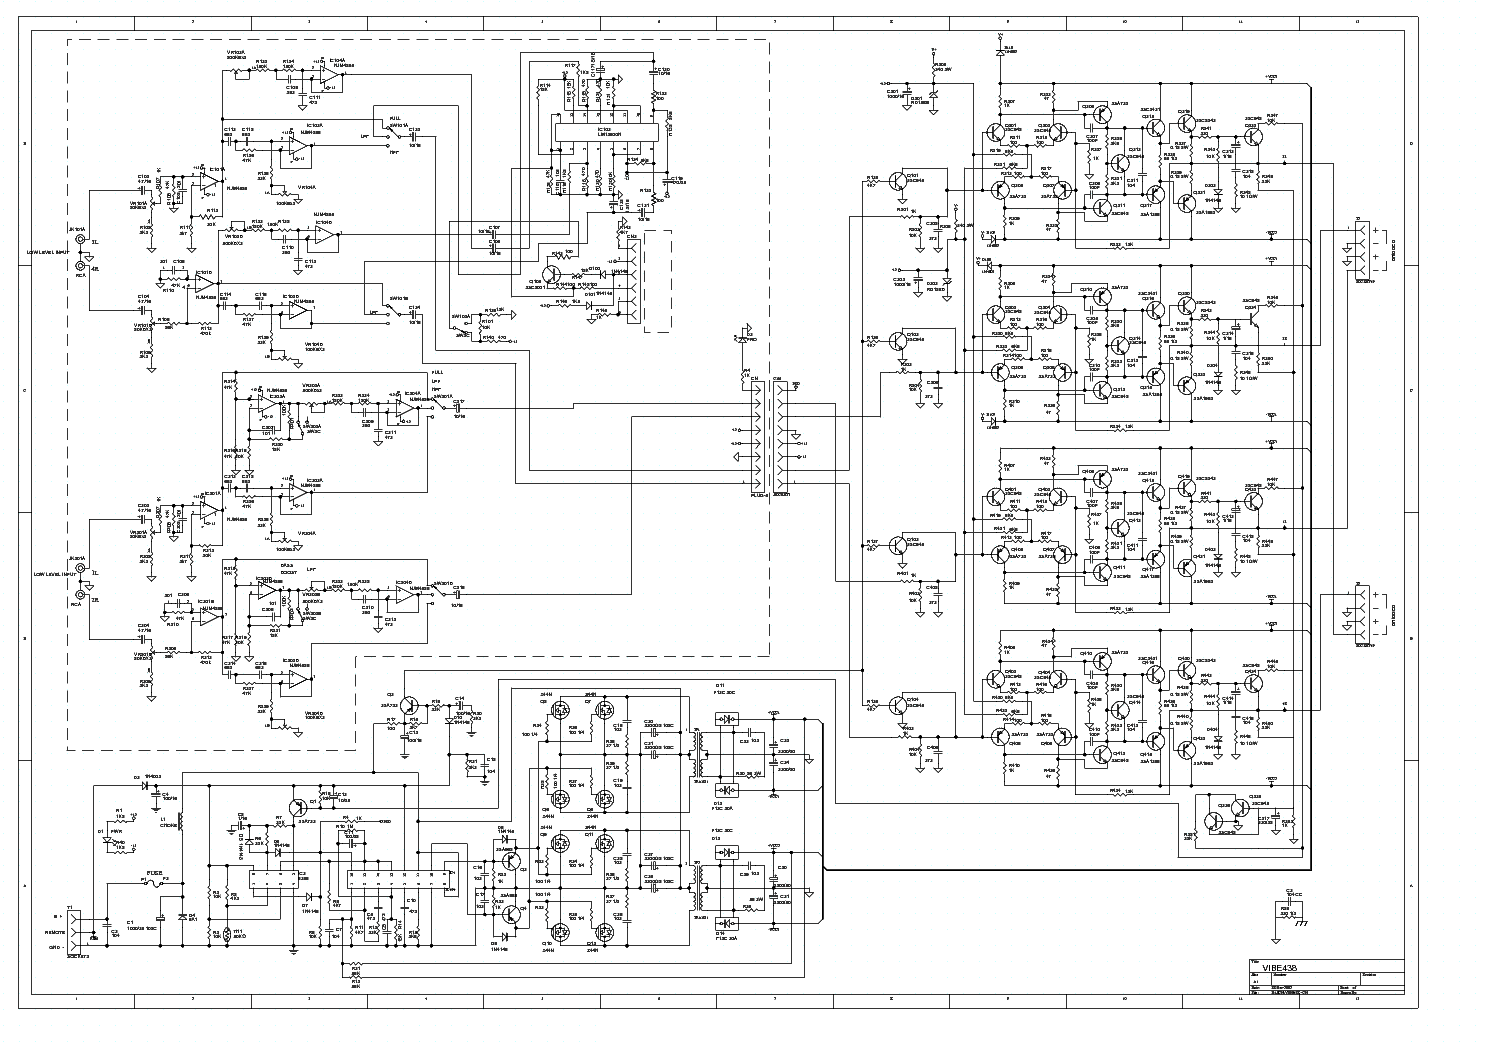 Lanzar Mxa422 Car Amplifier Sch Service Manual Download Schematics Diagram Vibe436